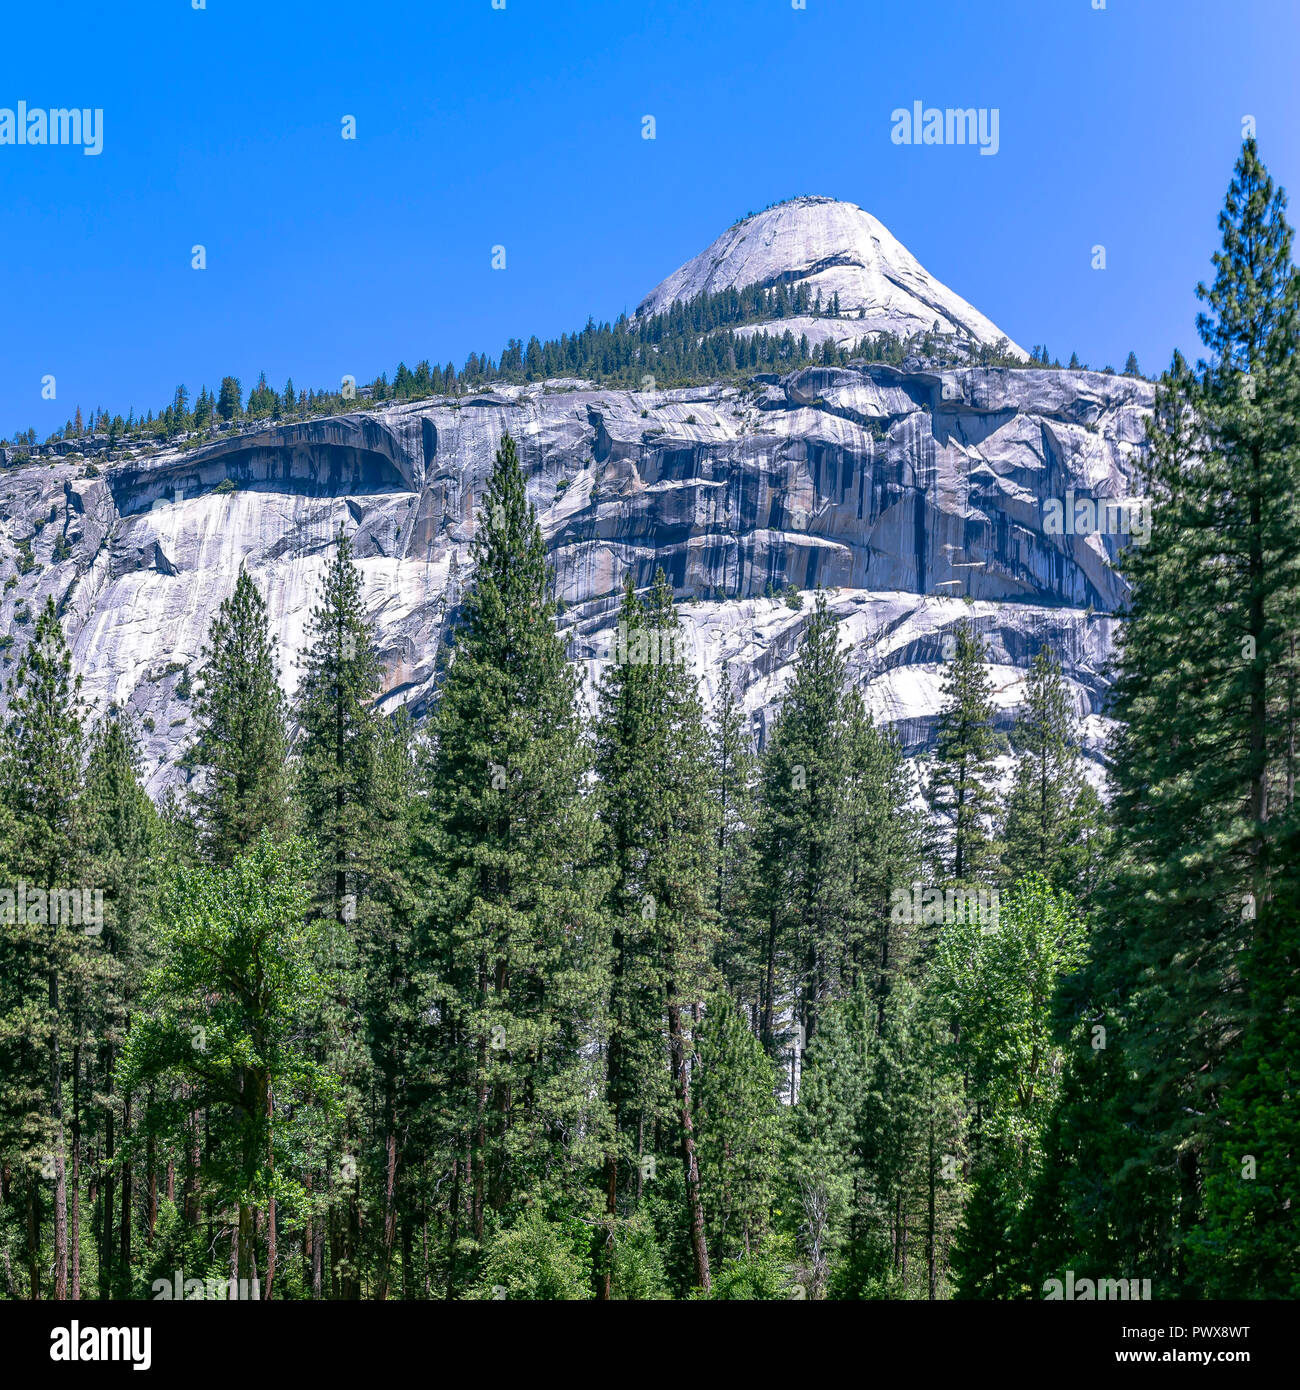 White Mountain y árboles altísimos en Yosemite CA Imagen De Stock